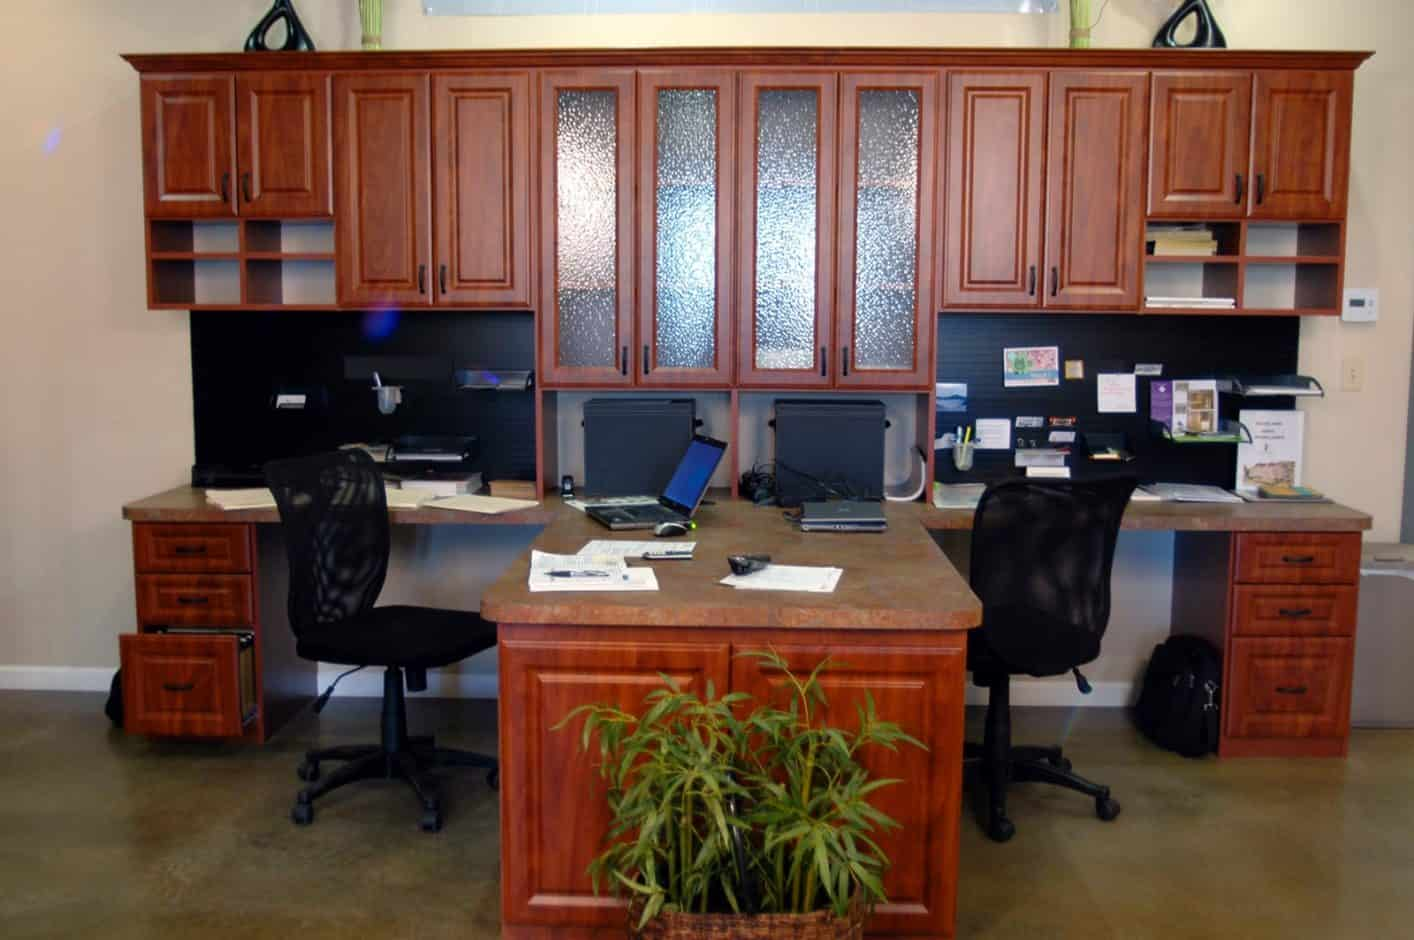 Office Desk Storage - Summer Flame